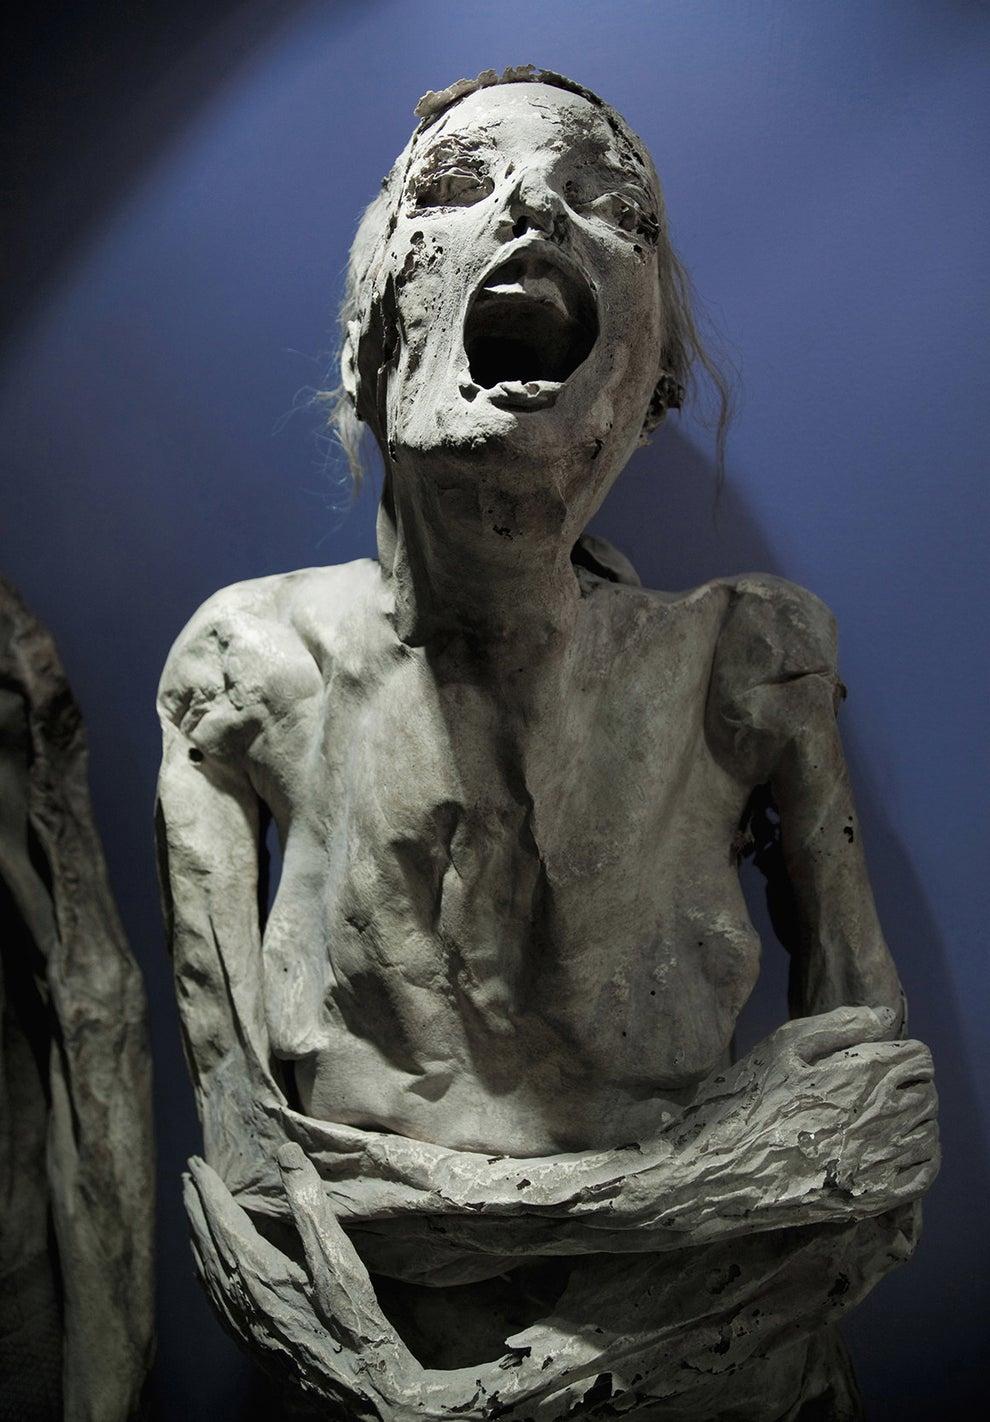 The Mummies of Guanajuato, Mexico